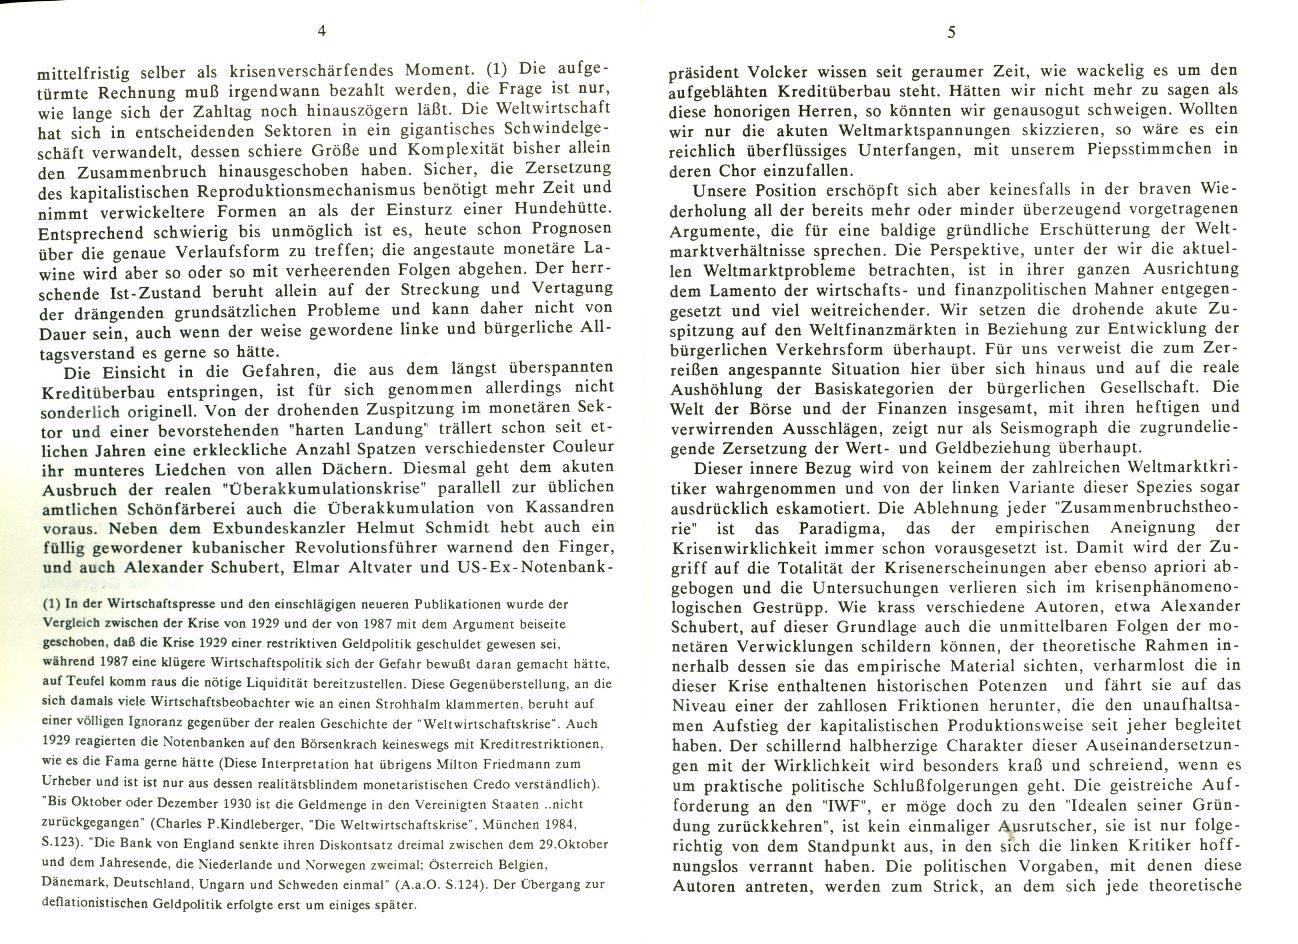 Erlangen_VMK_MK_1989_06_003